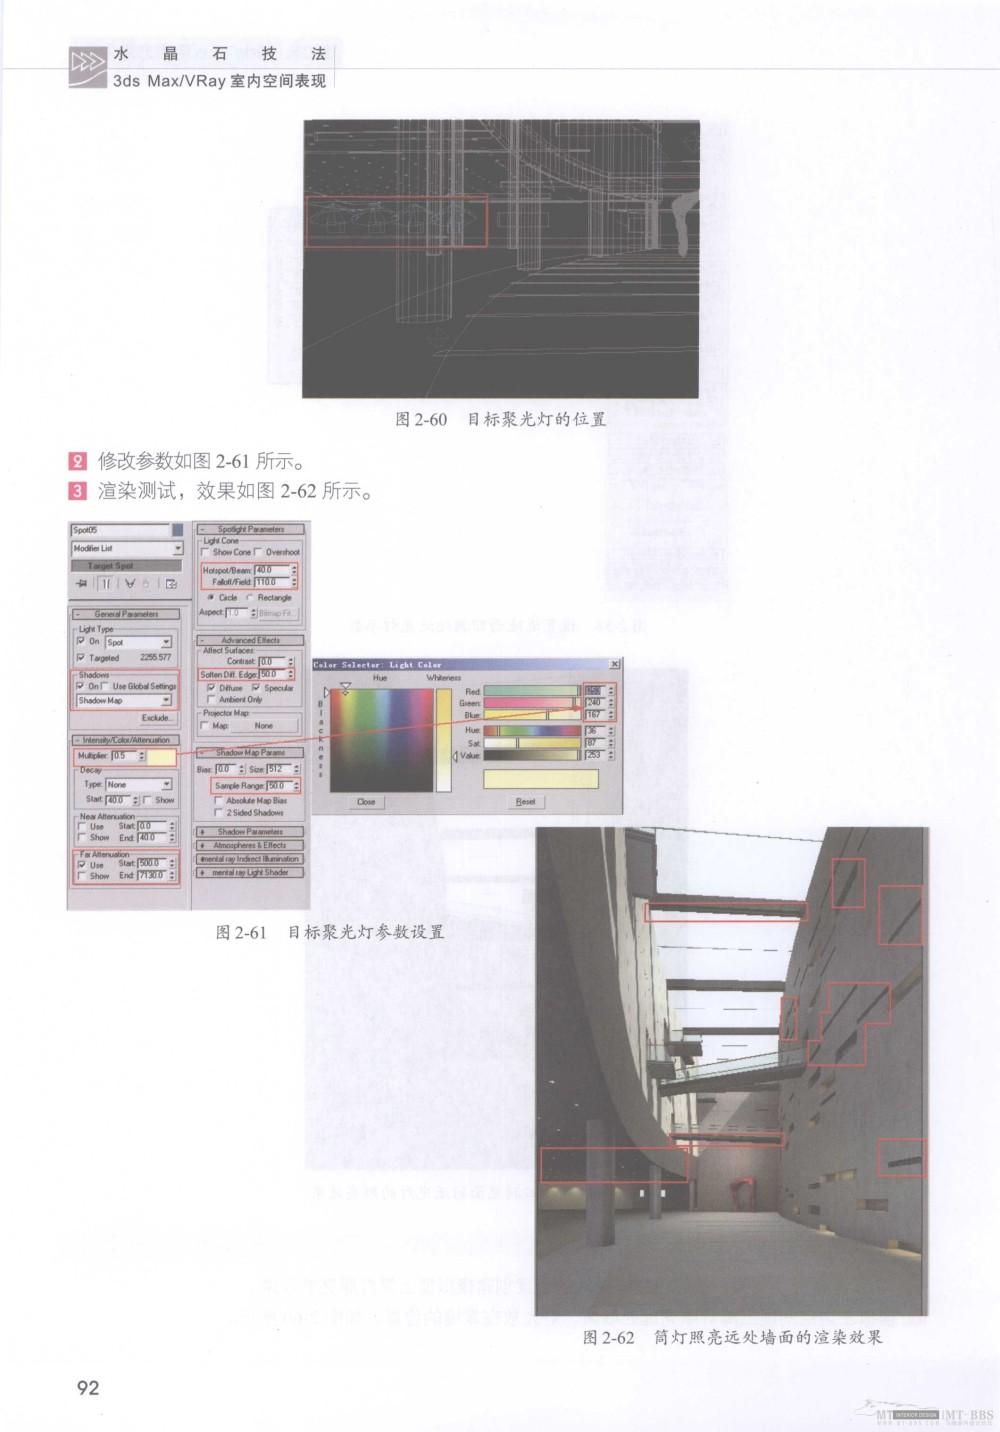 水晶石技法-3ds_Max&VRay室内空间表现_水晶石技法-3ds_Max&VRay室内空间表现_页面_098.jpg